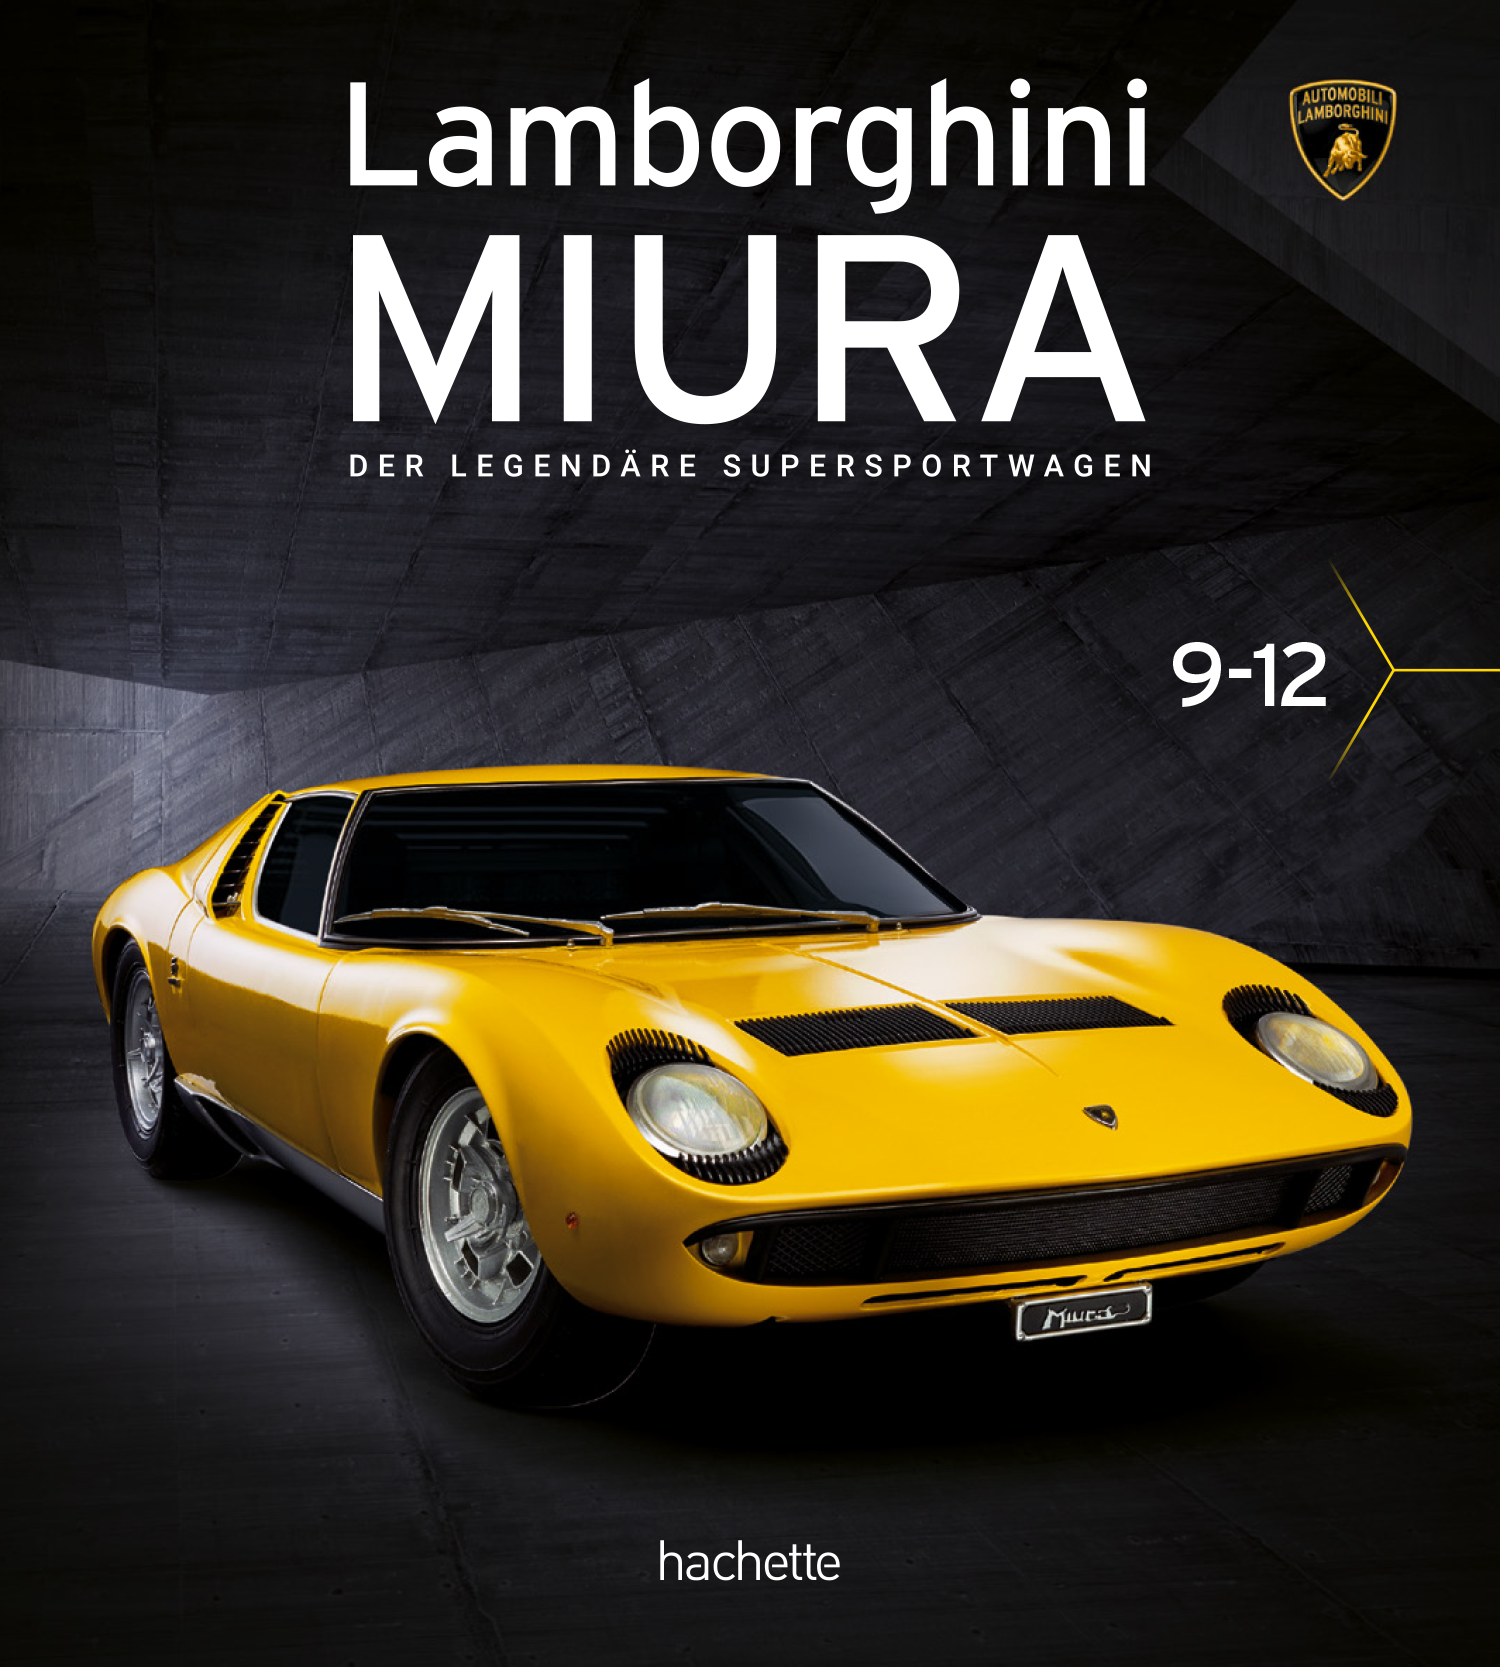 Lamborghini Miura – Lieferung 03